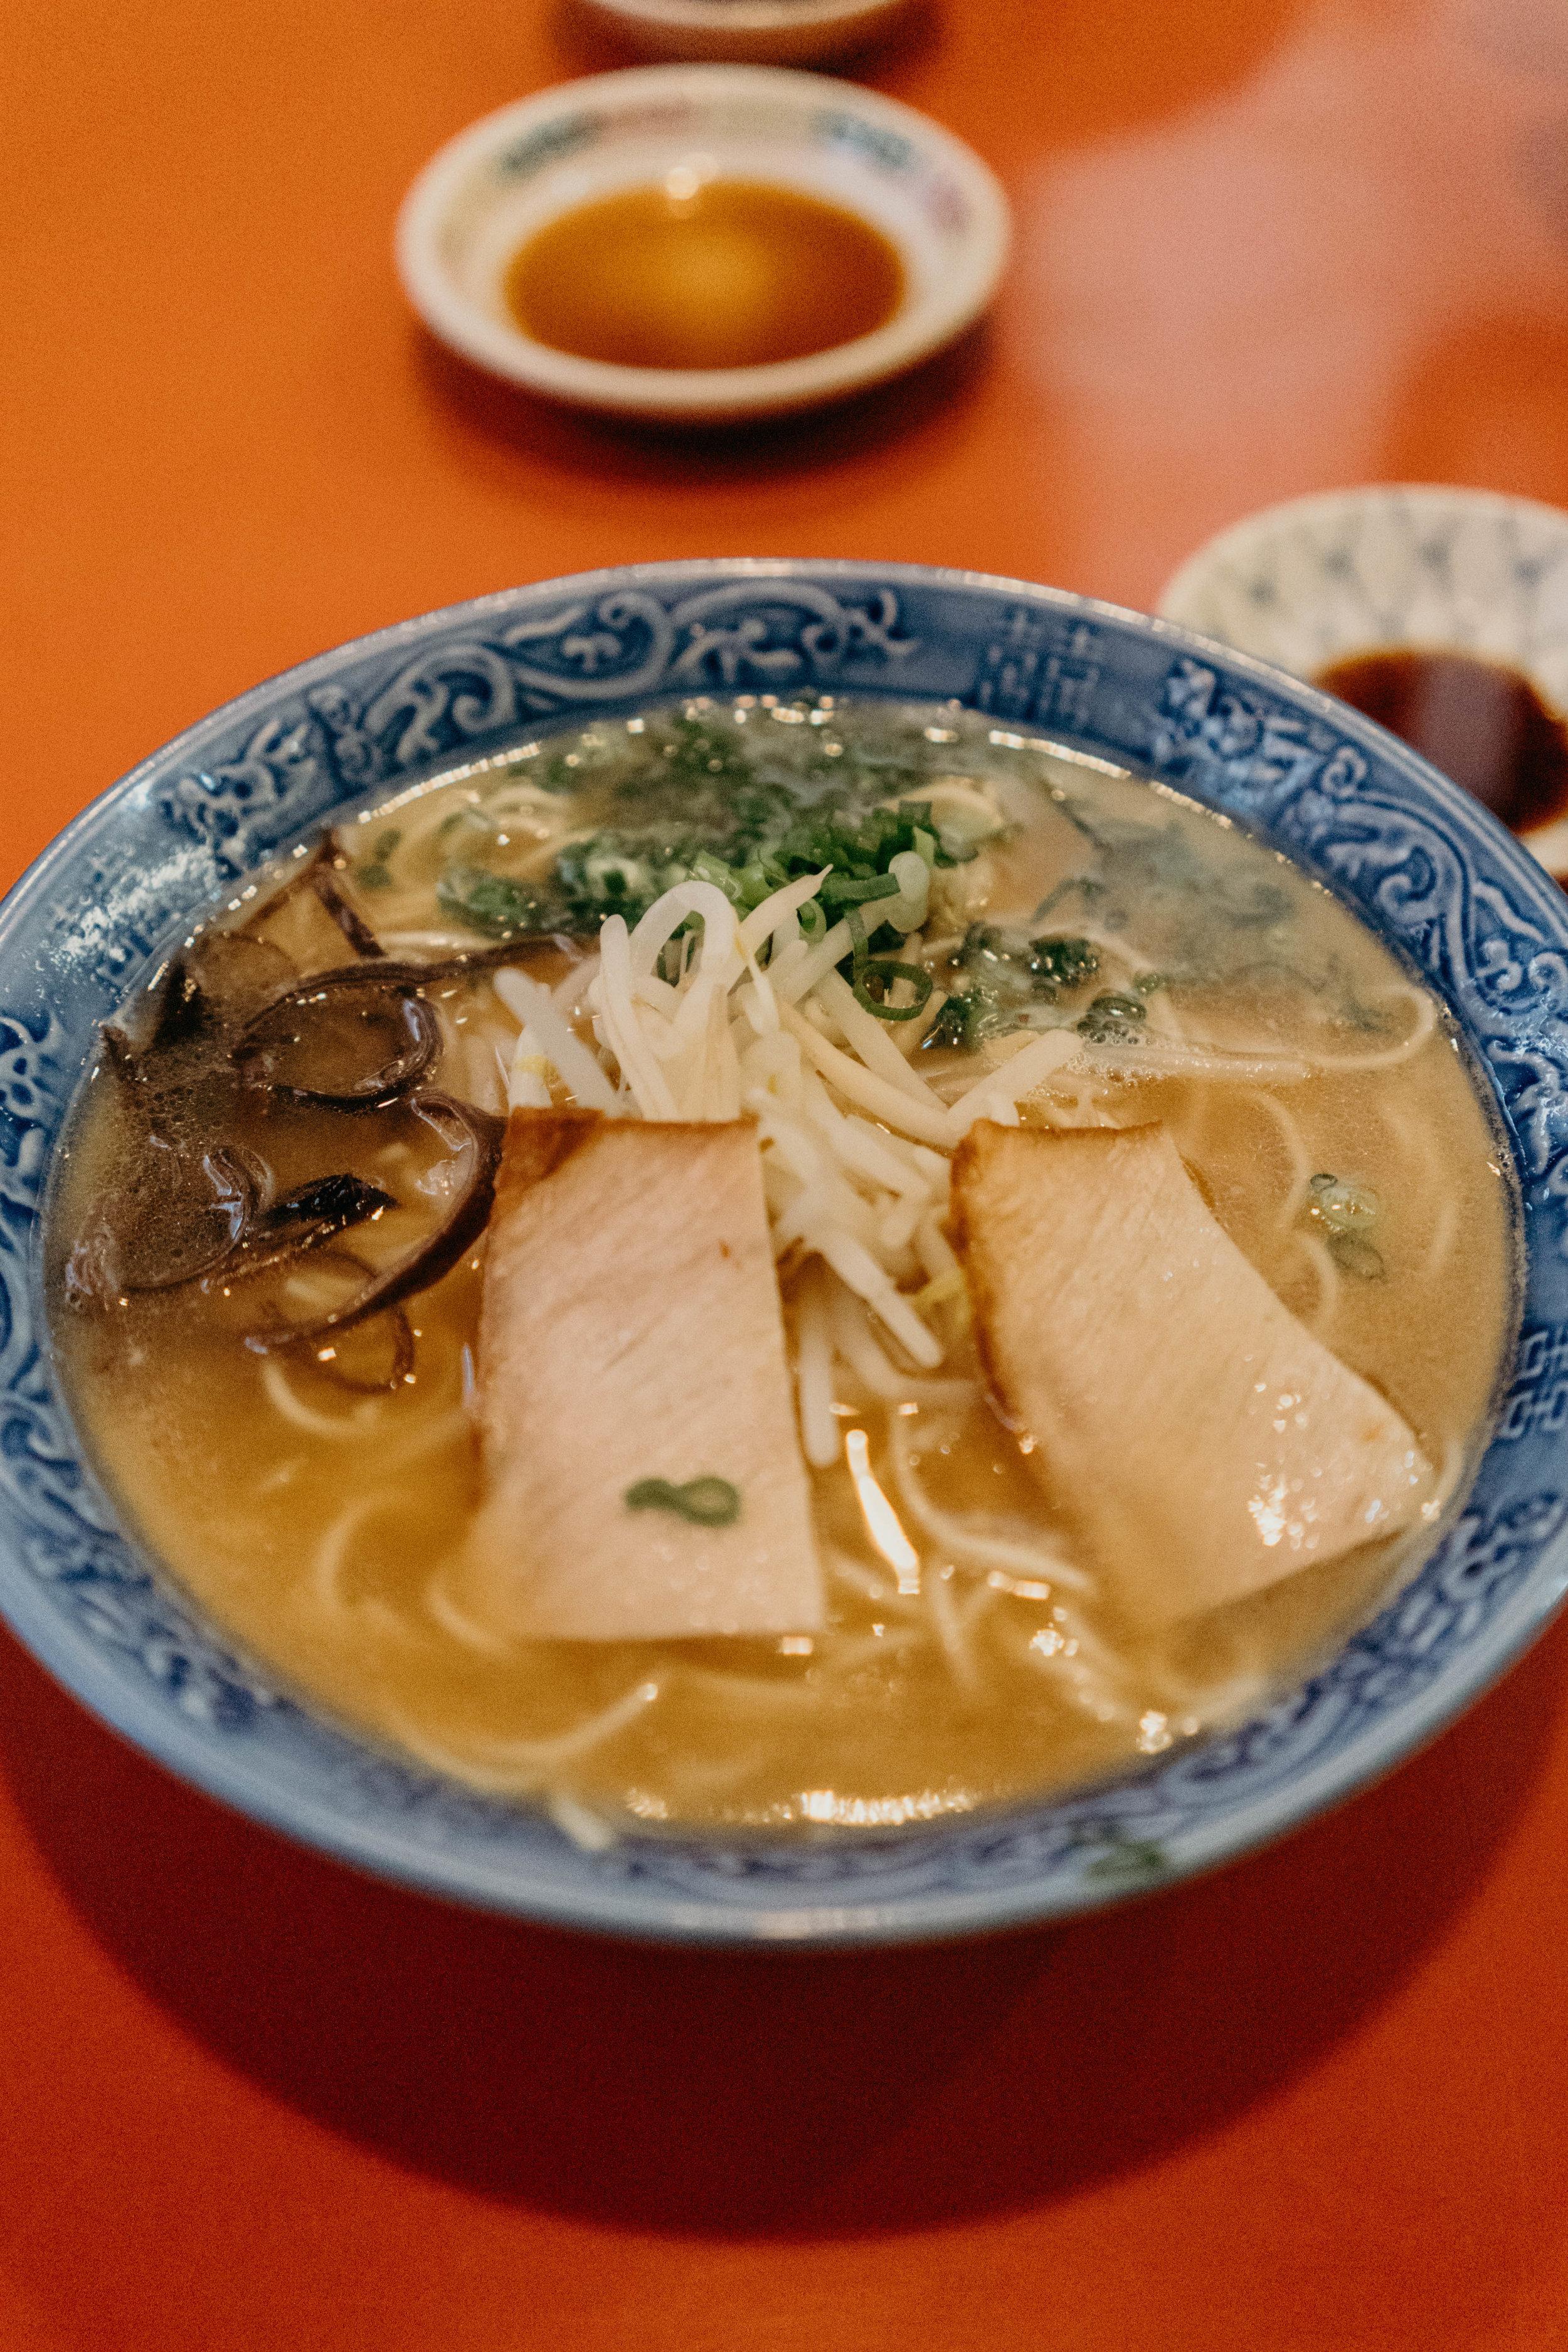 A Weekend in Kitakyushu, Japan | On the Street Where We Live ( aretherelilactrees.com )  Yomohei, ramen